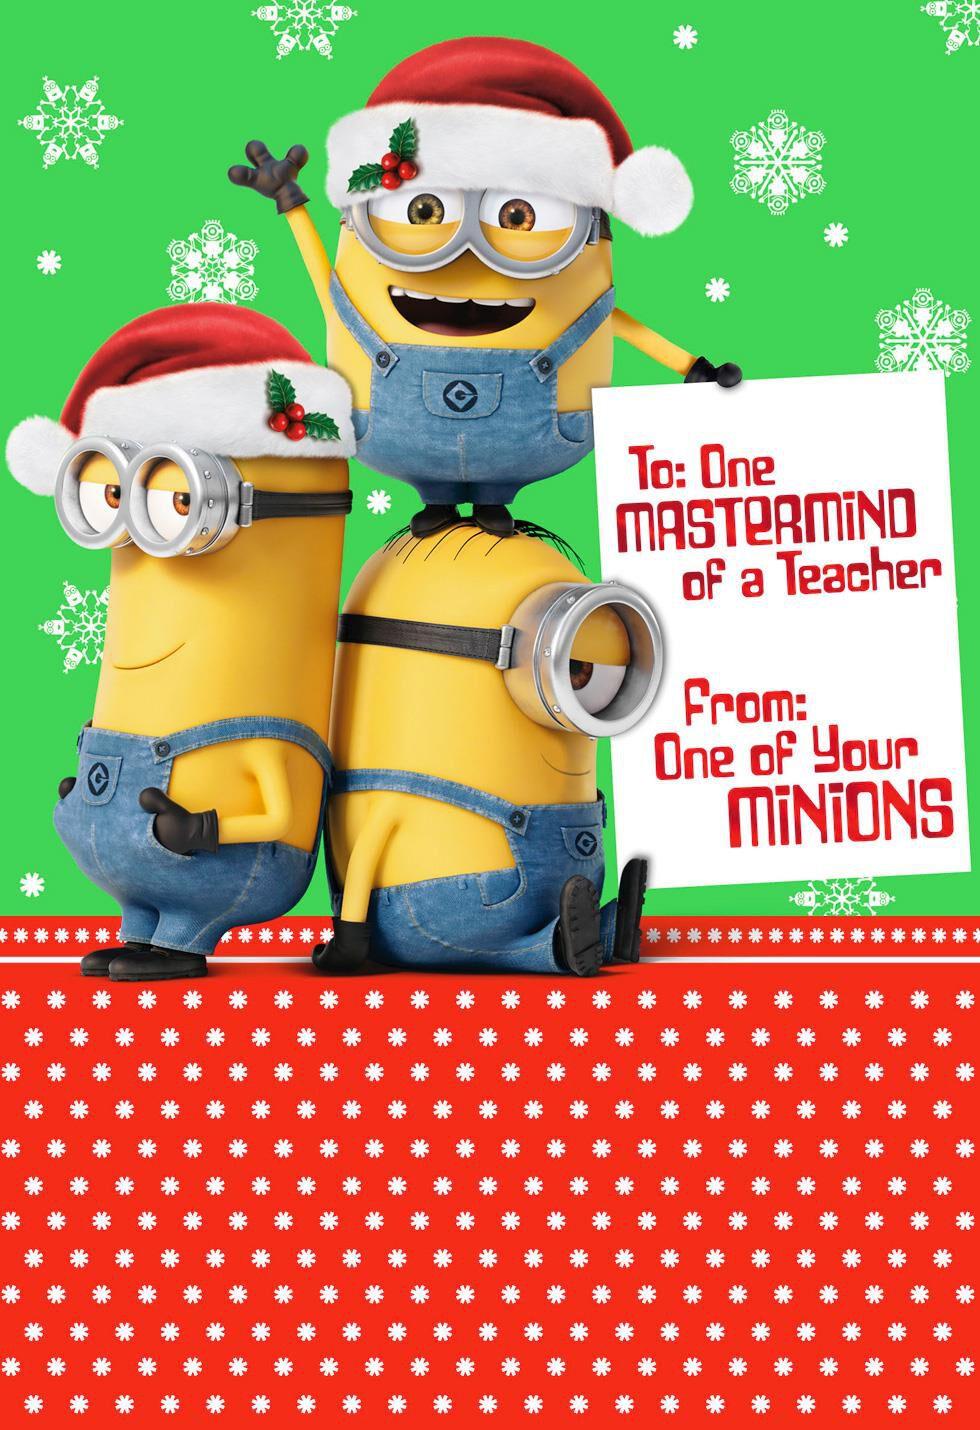 Despicable Me Minions Mastermind Christmas Card for Teacher ...